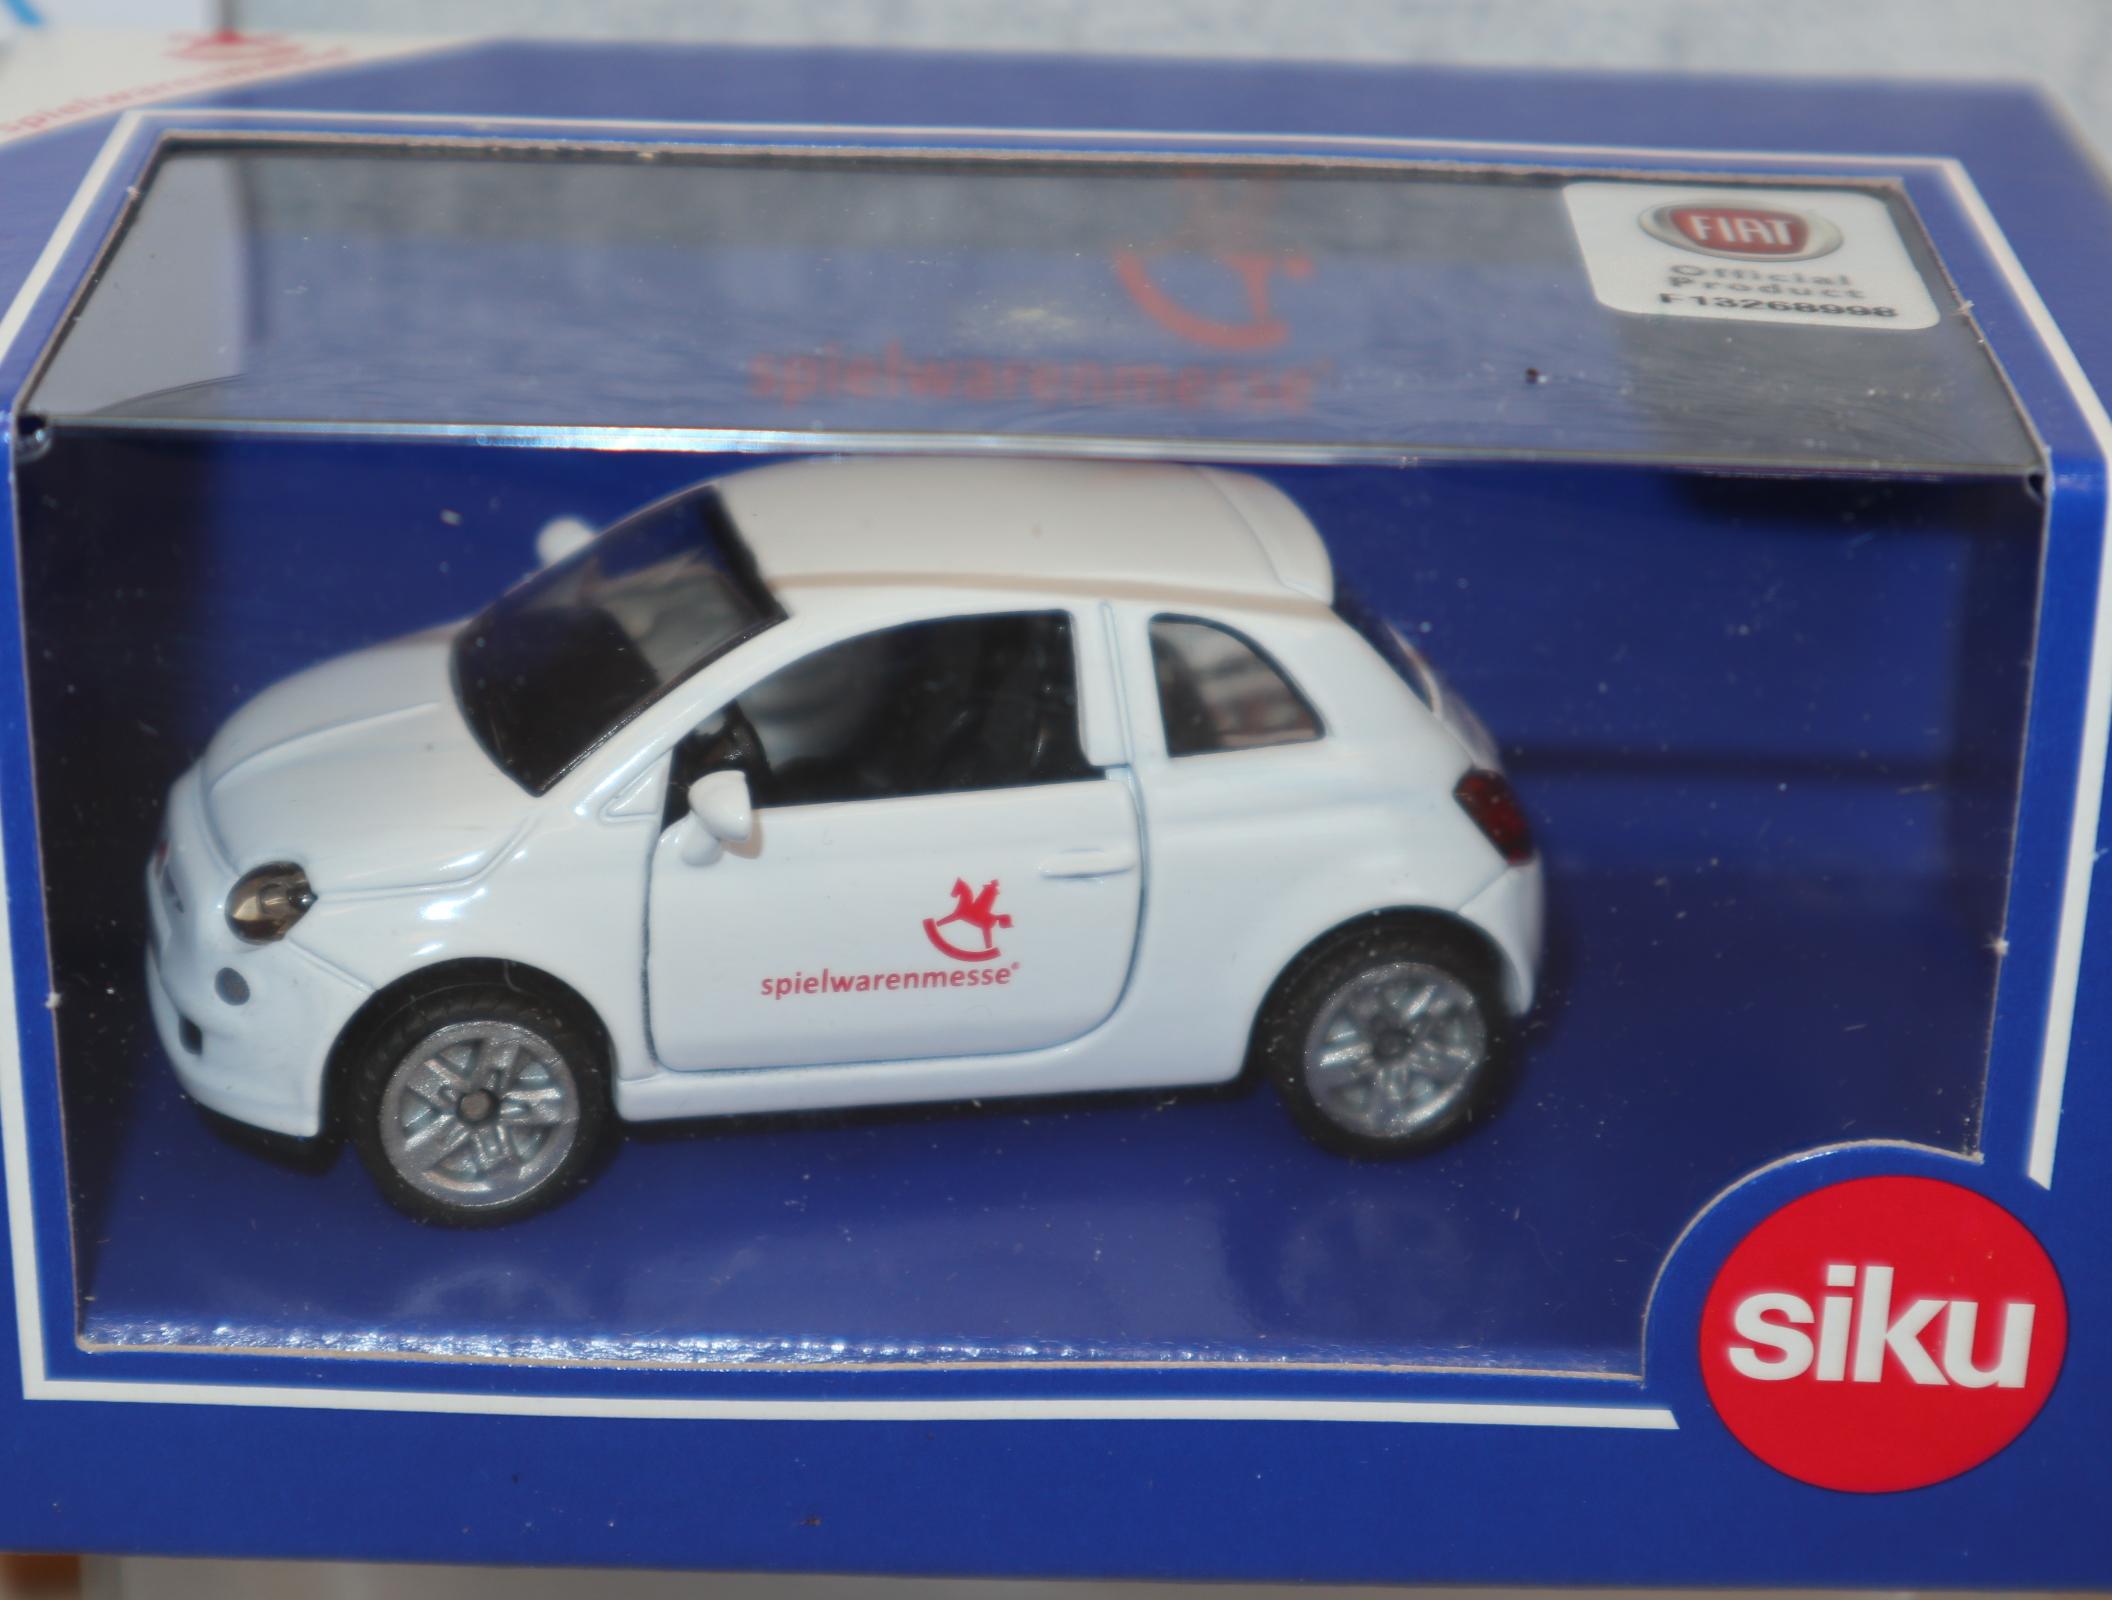 Siku 1453 1:50 Fiat 500 Sondermodell Spielwarenmesse Nürnberg 2017  in OVP